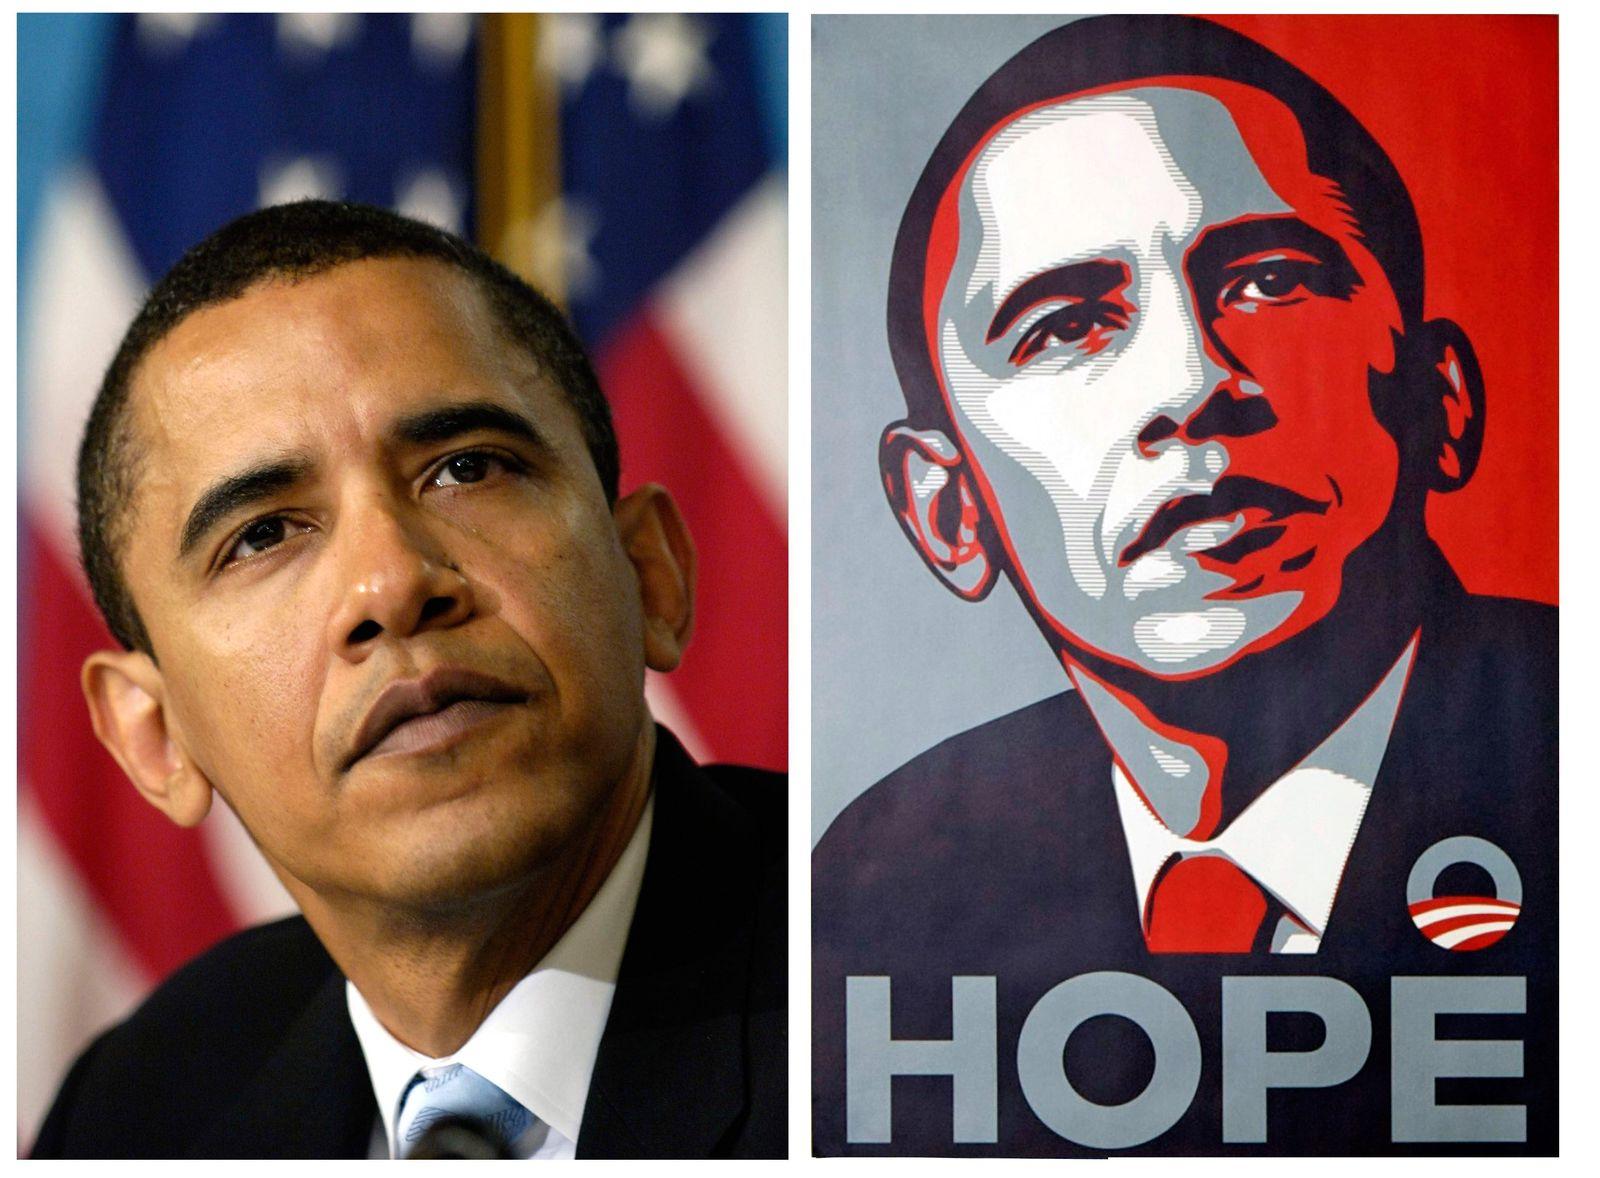 Obama/ Poster